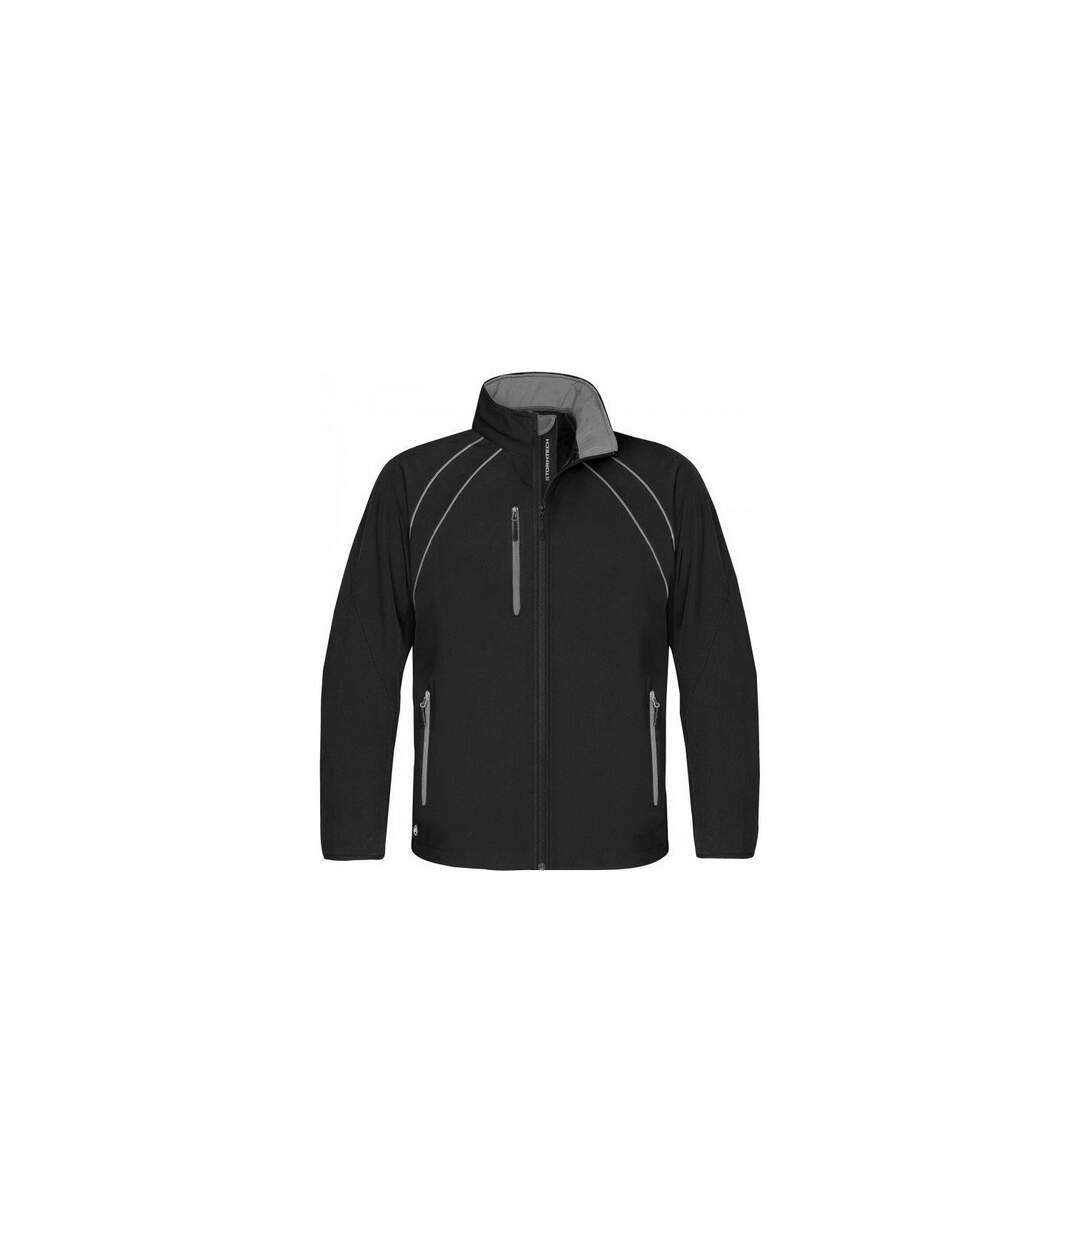 Stormtech Mens Crew Softshell Jacket (Black/Granite) - UTBC1169